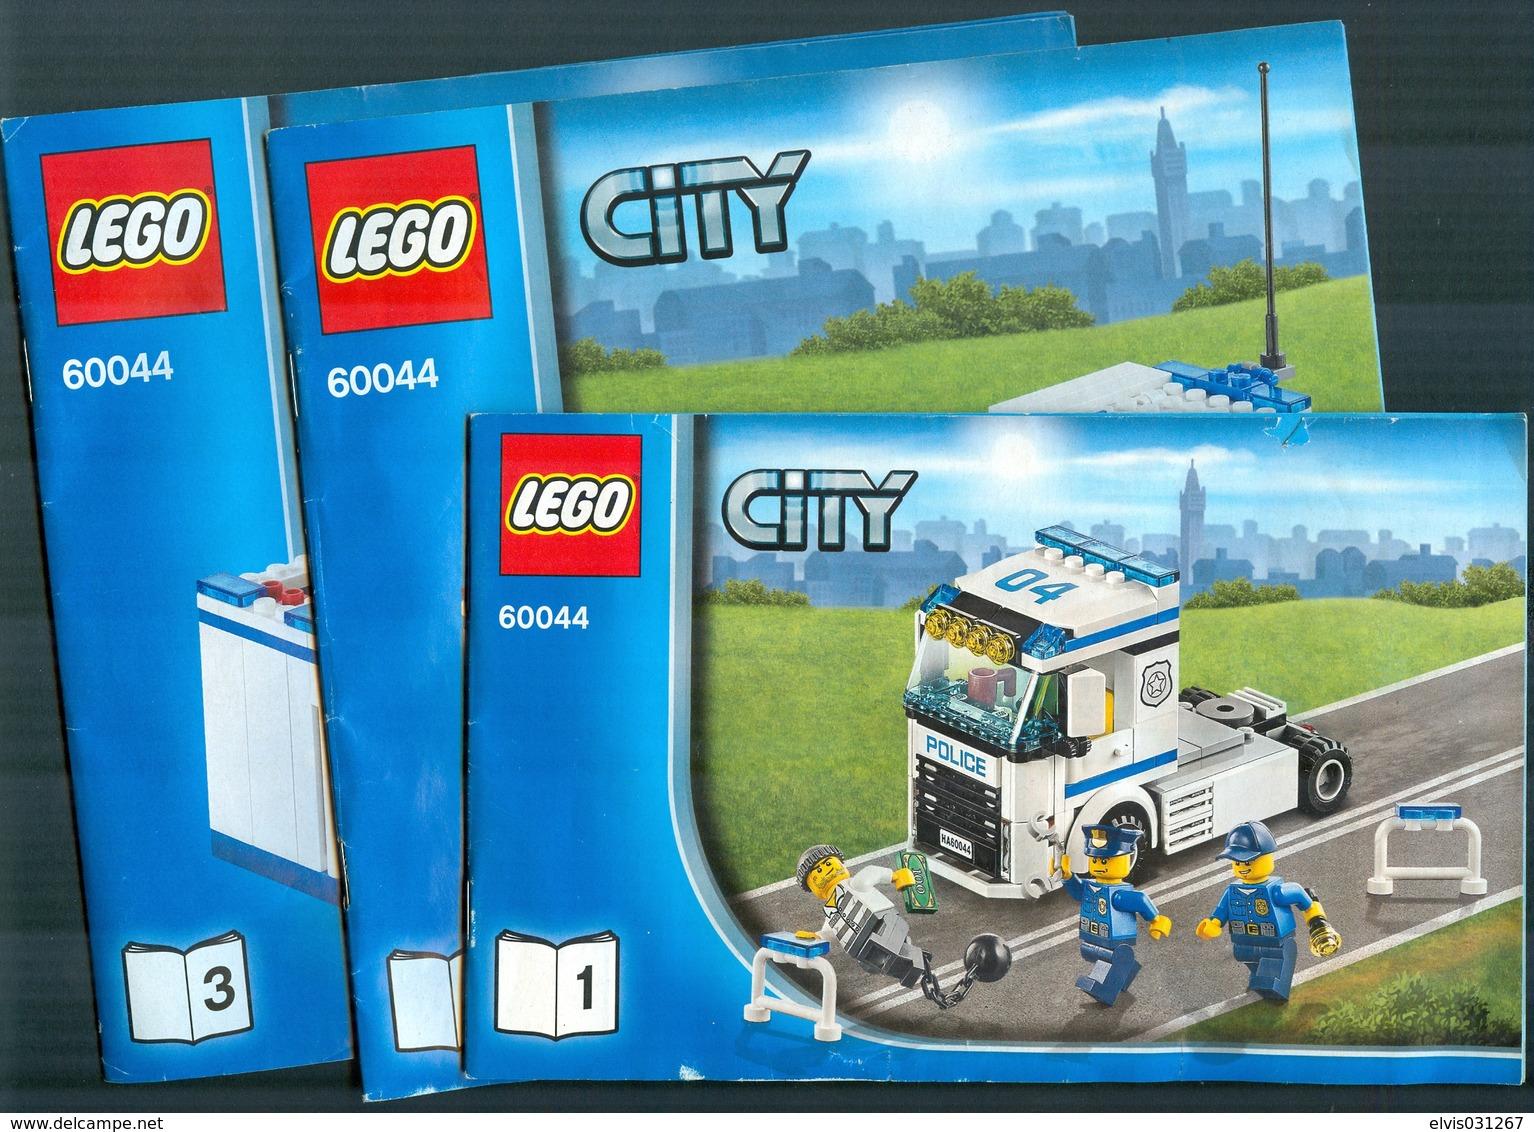 LEGO - 60044 INSTRUCTION MANUAL 3 PARTS - Original Lego 2014 - Catalogs